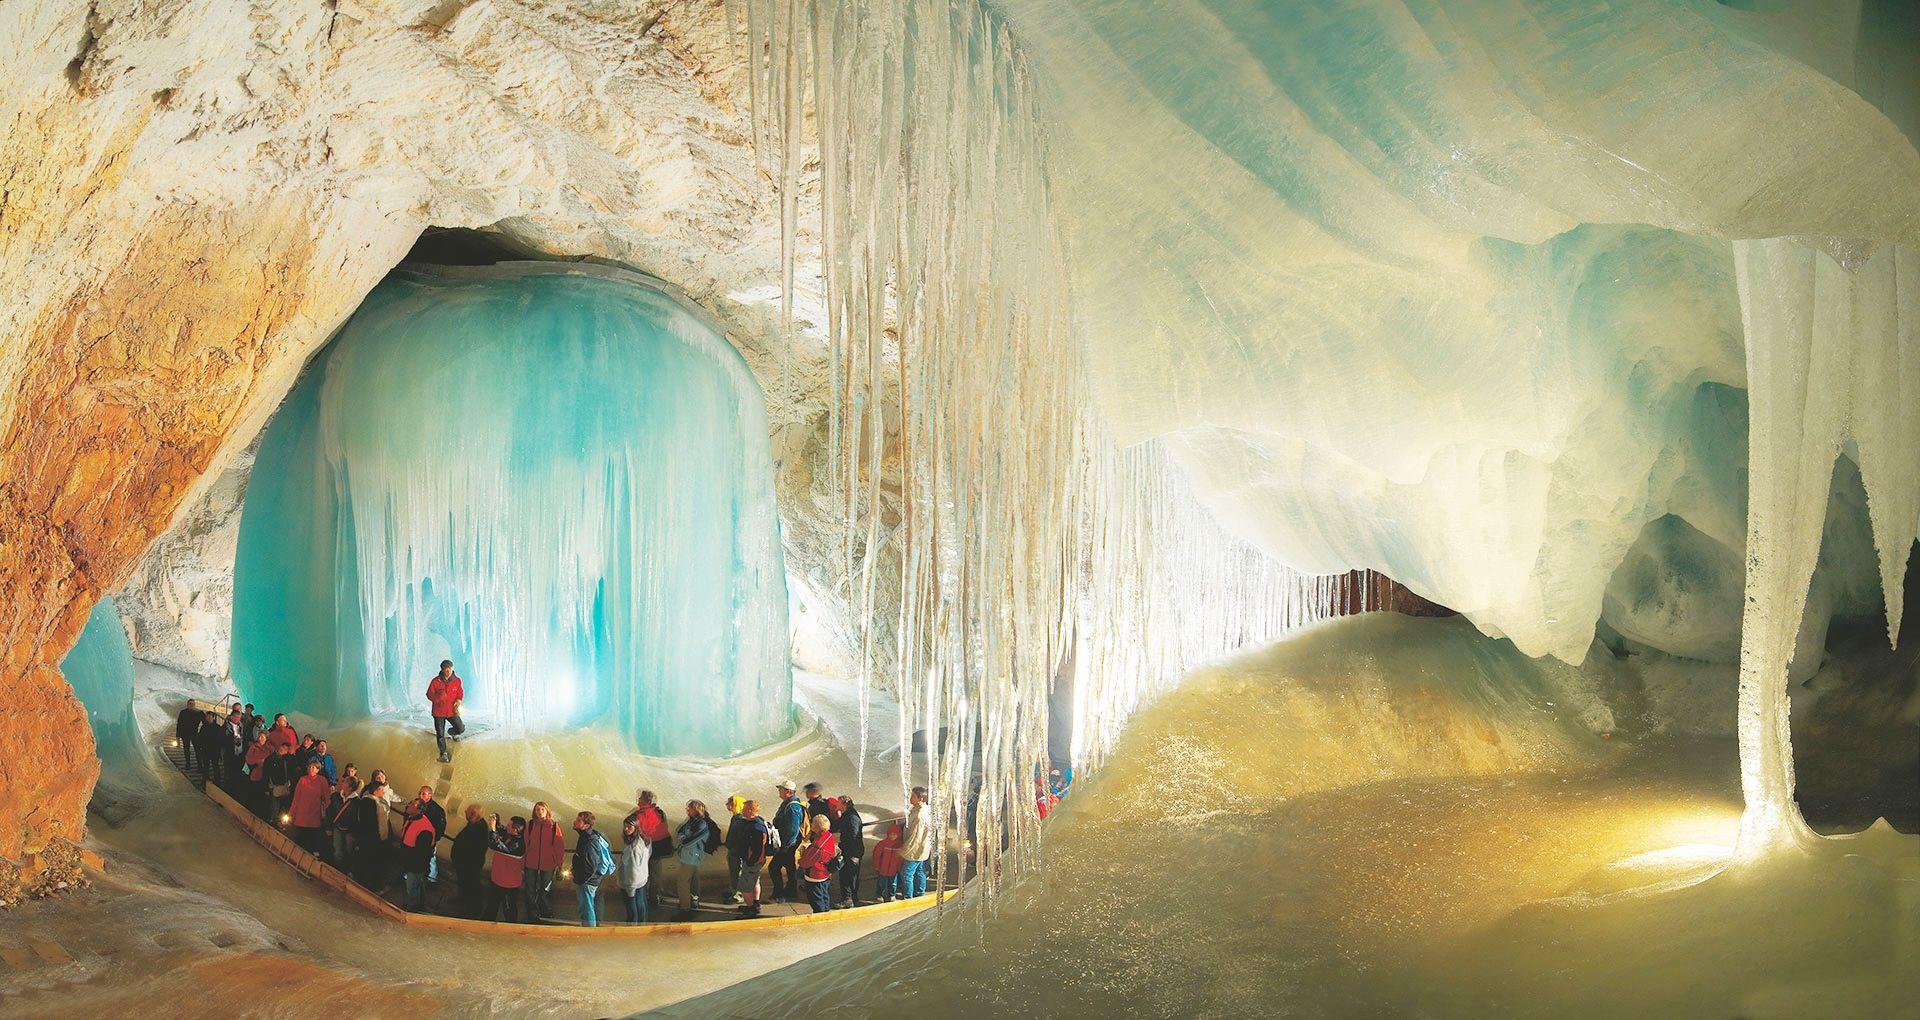 #Eisriesenwelt #IceCaves in #Austria http://goo.gl/IRYtPU  Amazing daily post & follow us ---► +DirectRooms